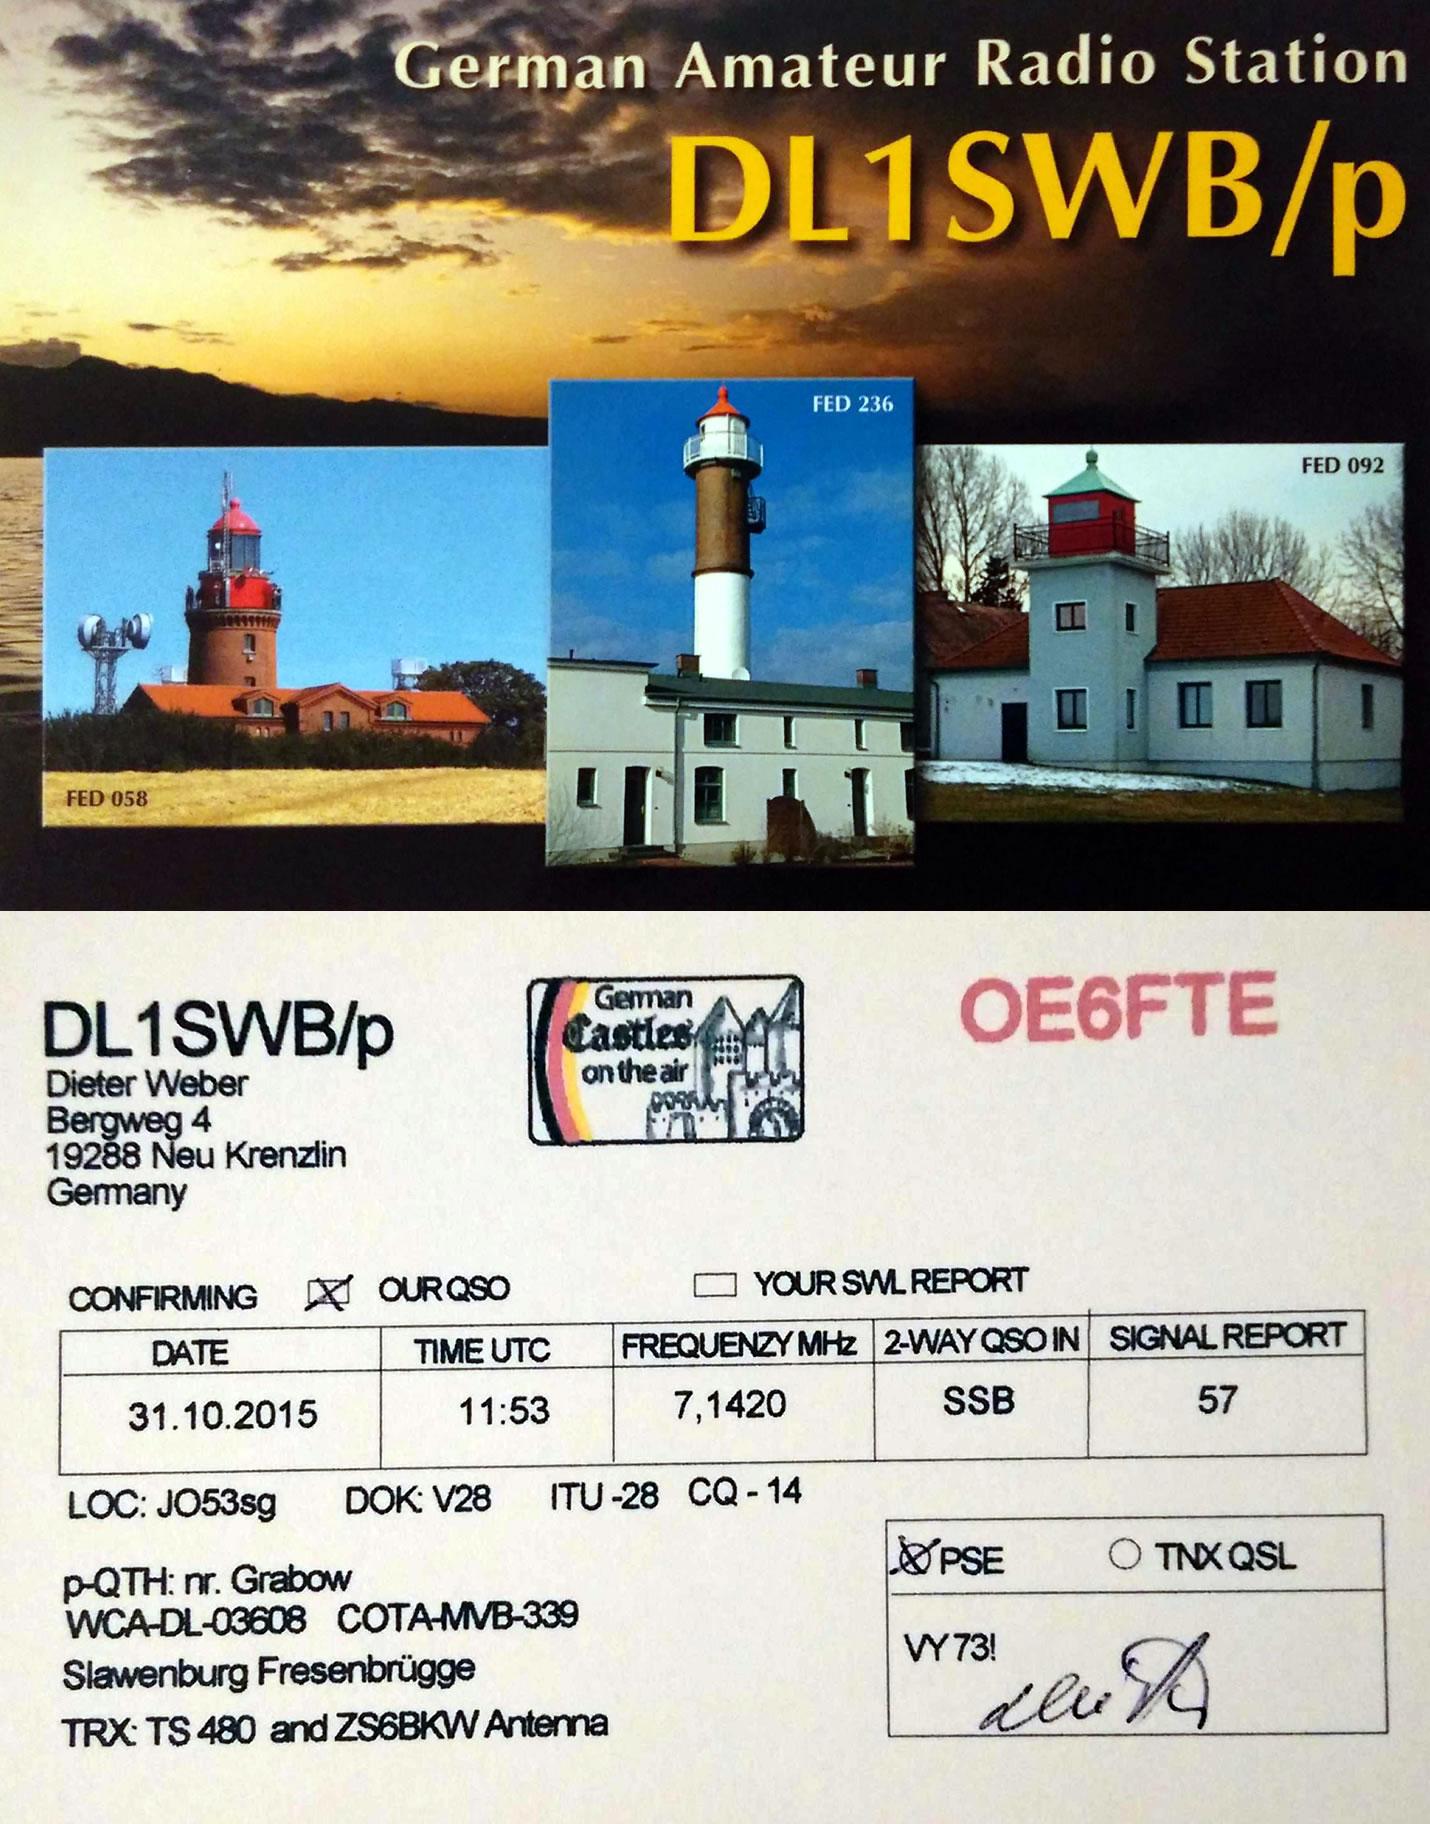 DL1SWB